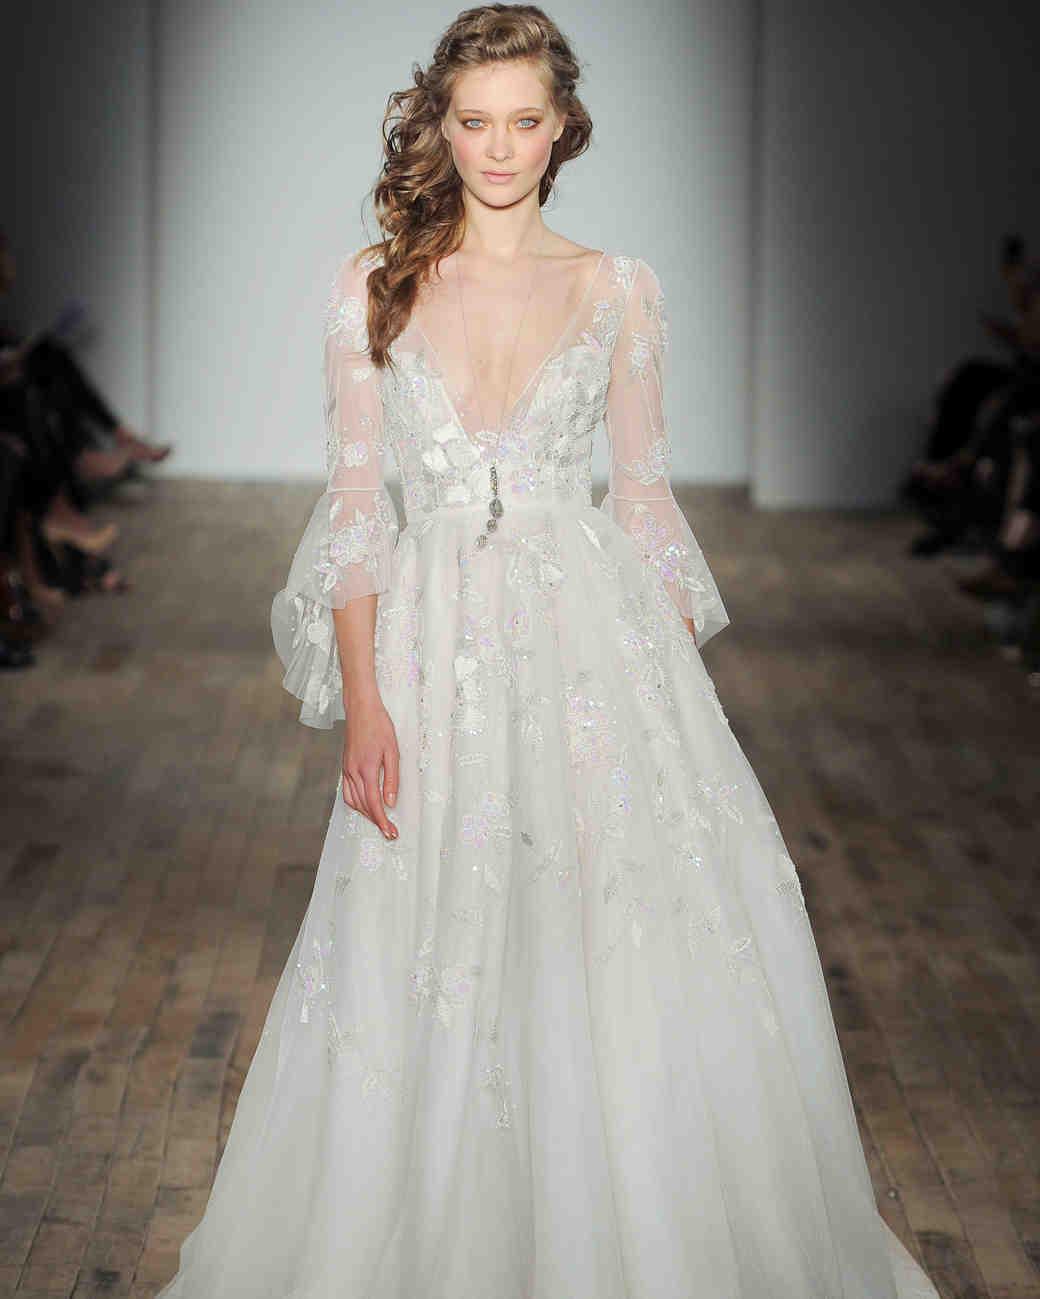 Elie saab spring 2018 wedding dress